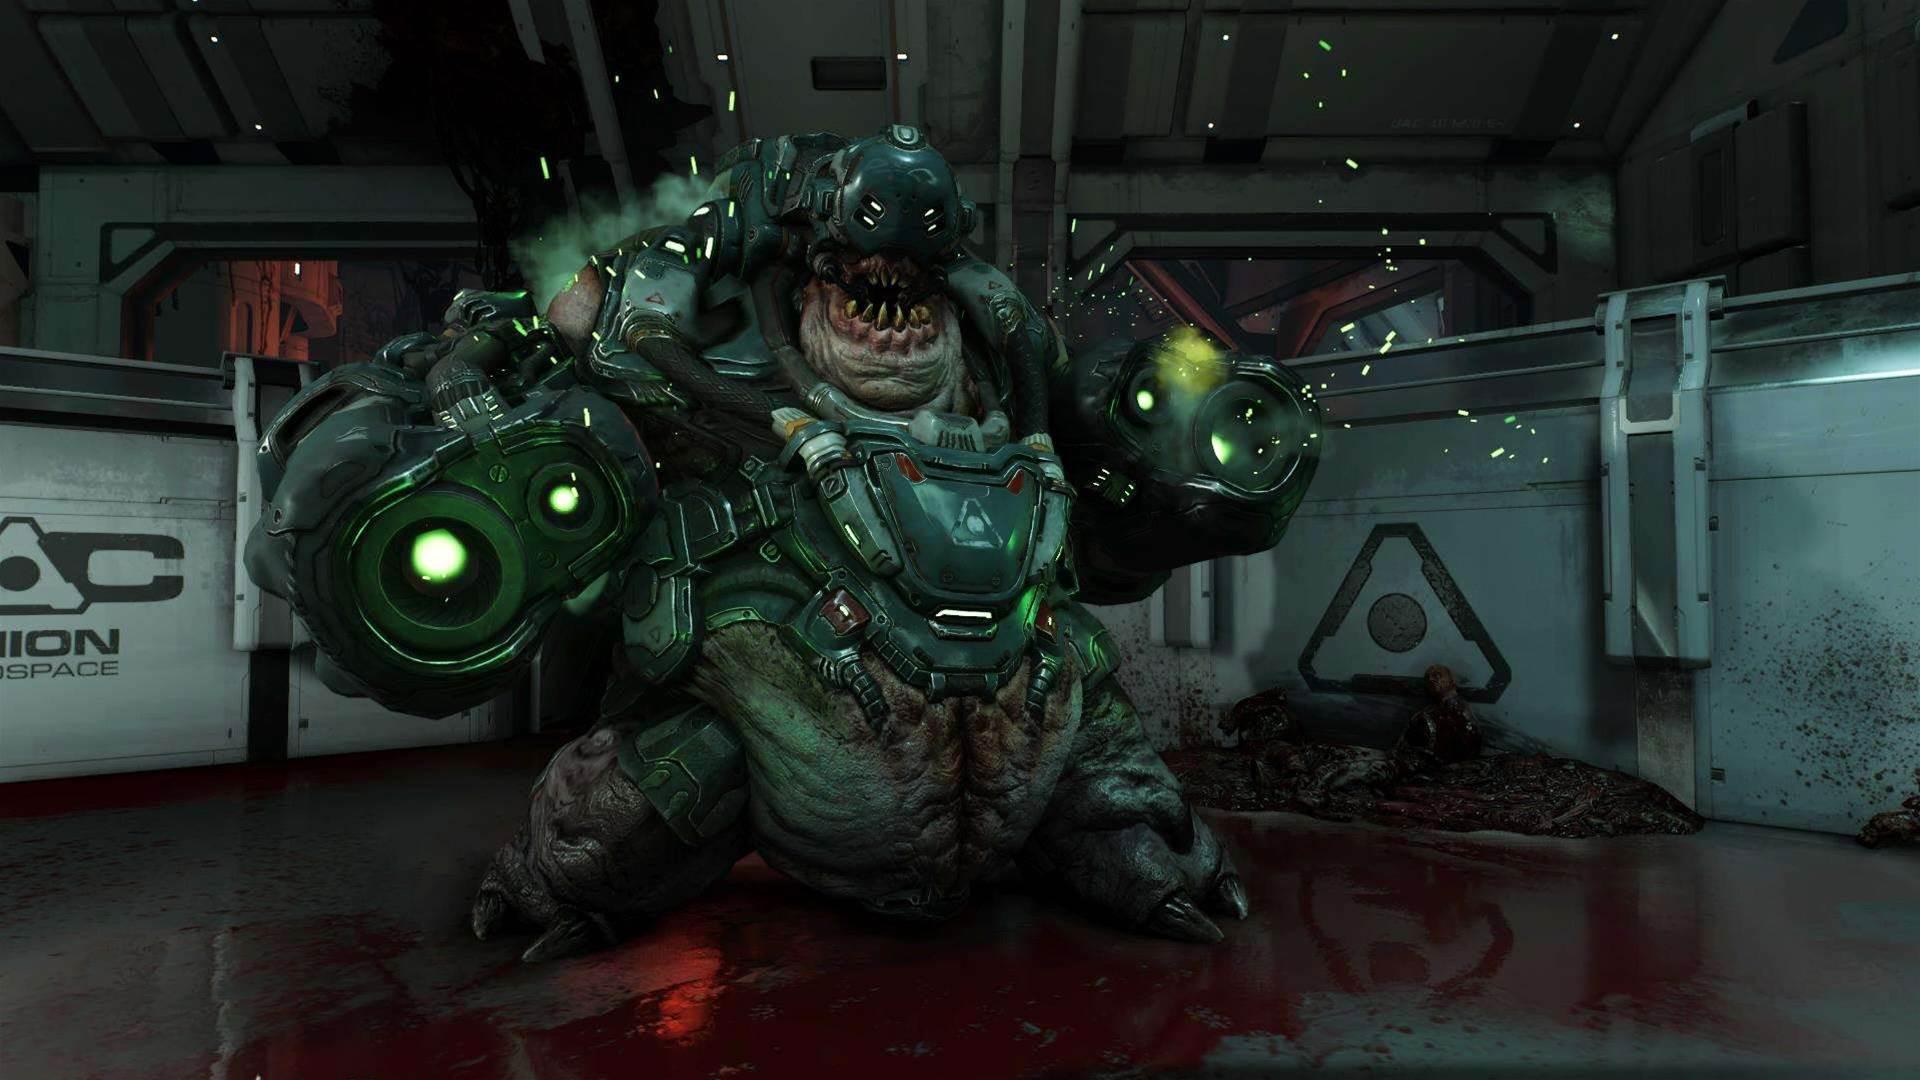 A handful of hellish new Doom screens